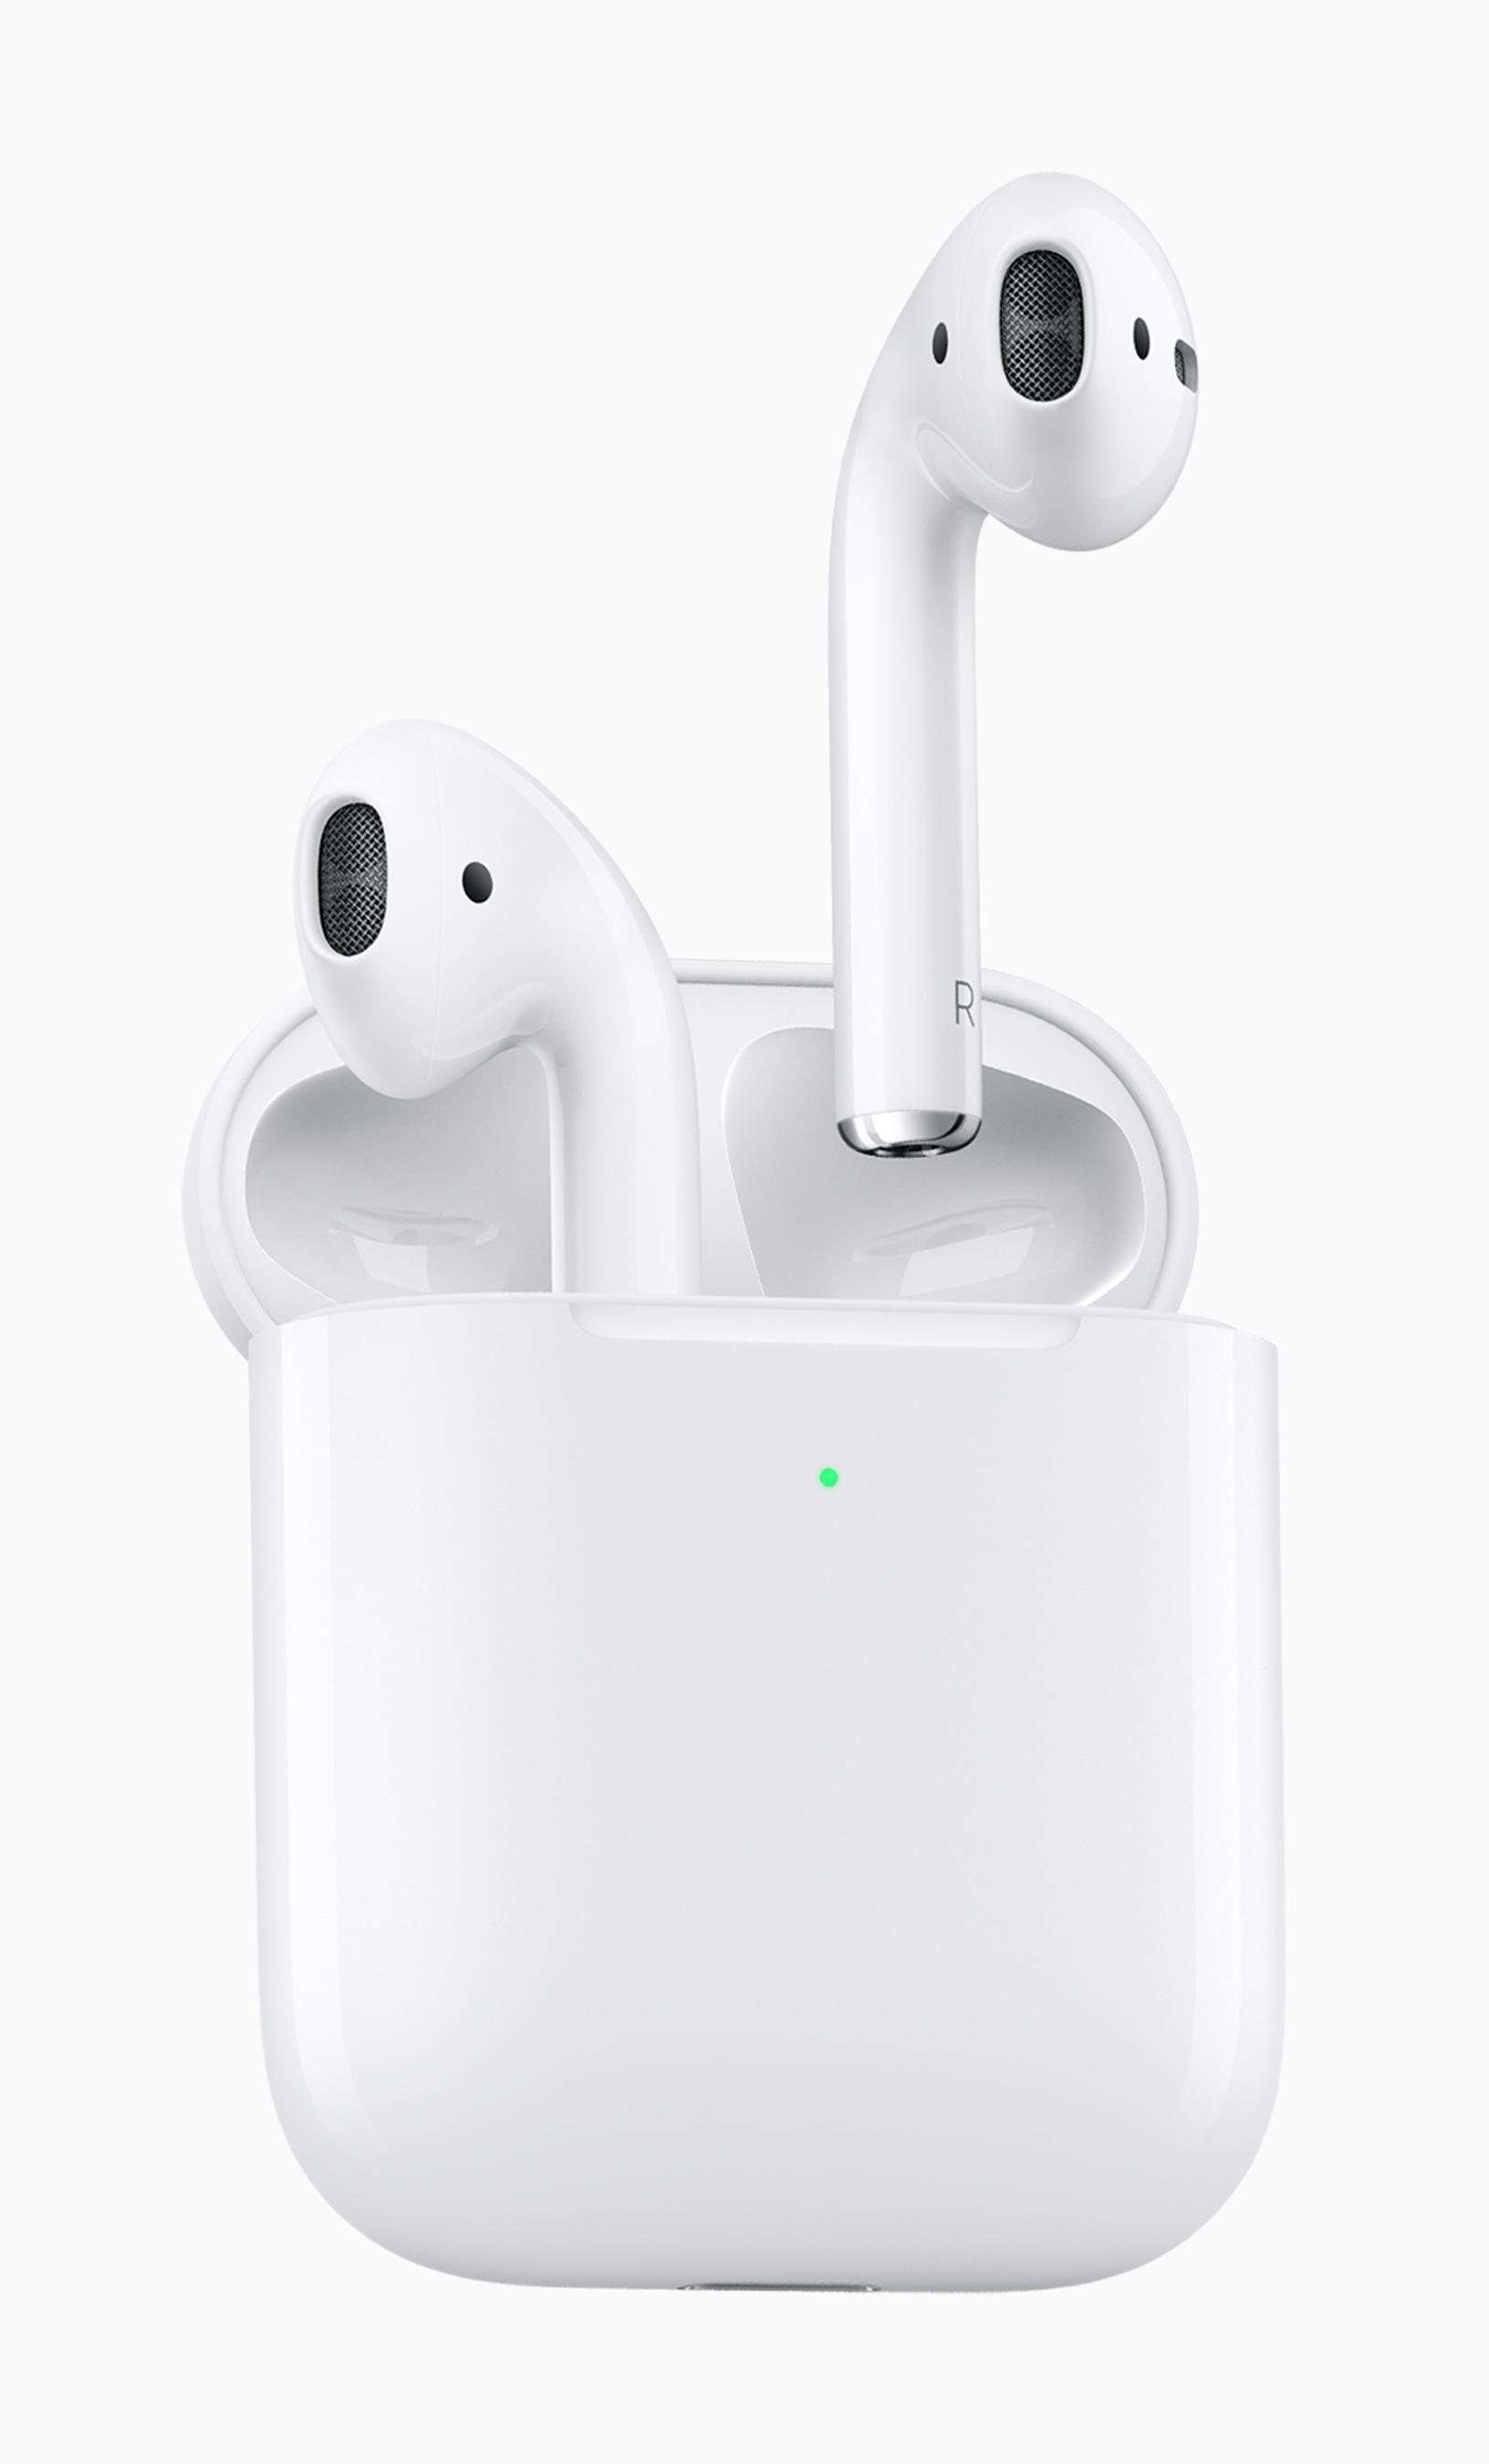 Wireless headphones for mac laptop